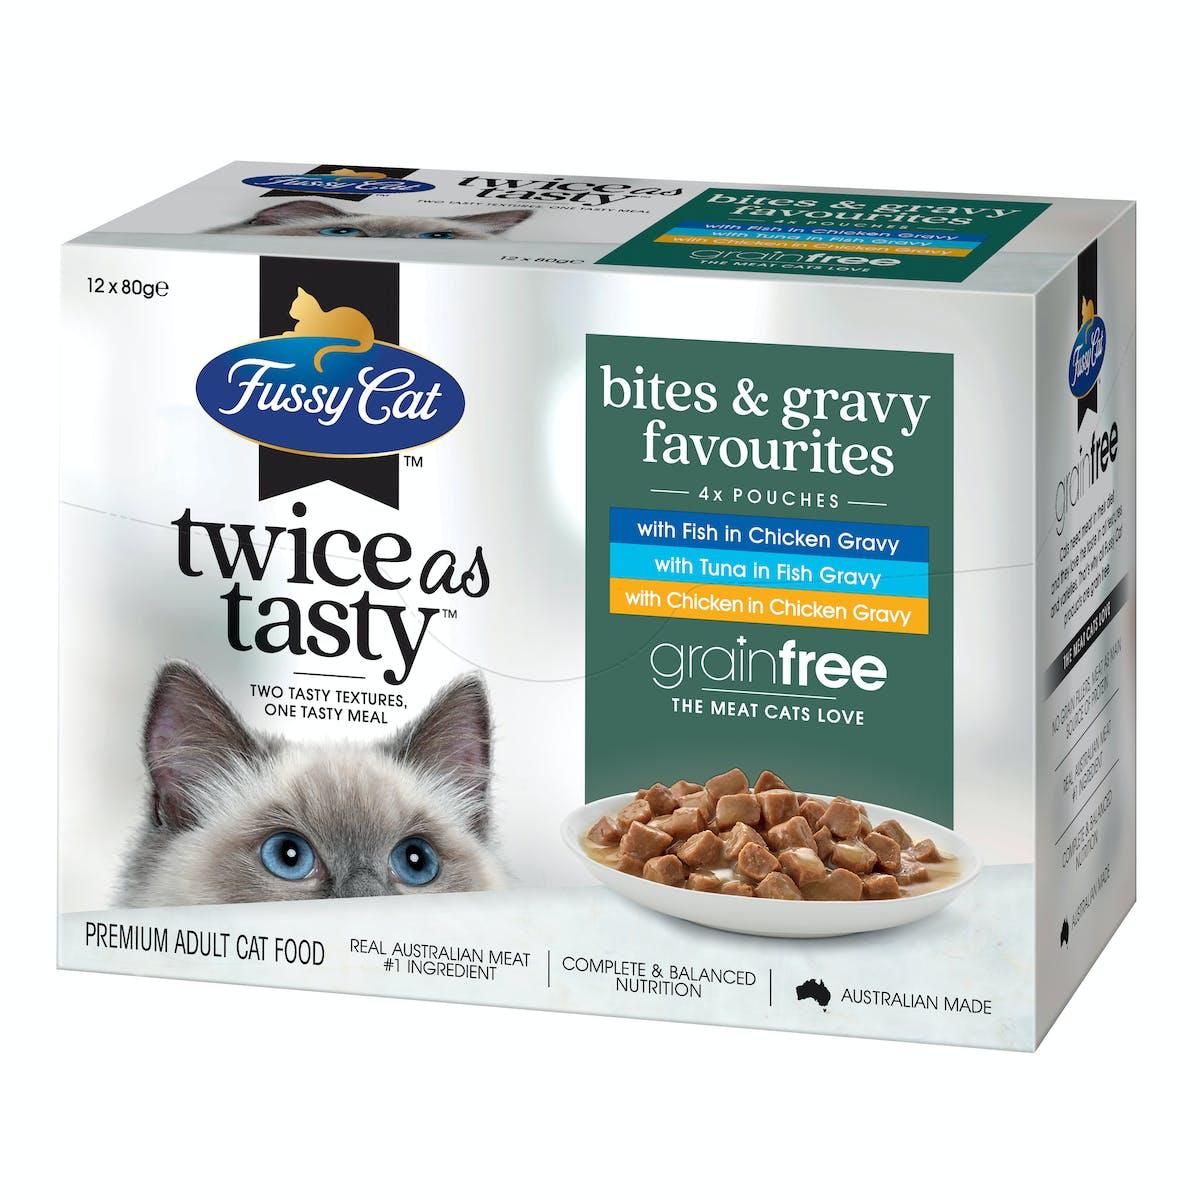 Fussy Cat | Bites & Gravy Favourites | Wet Cat Food | Left of pack